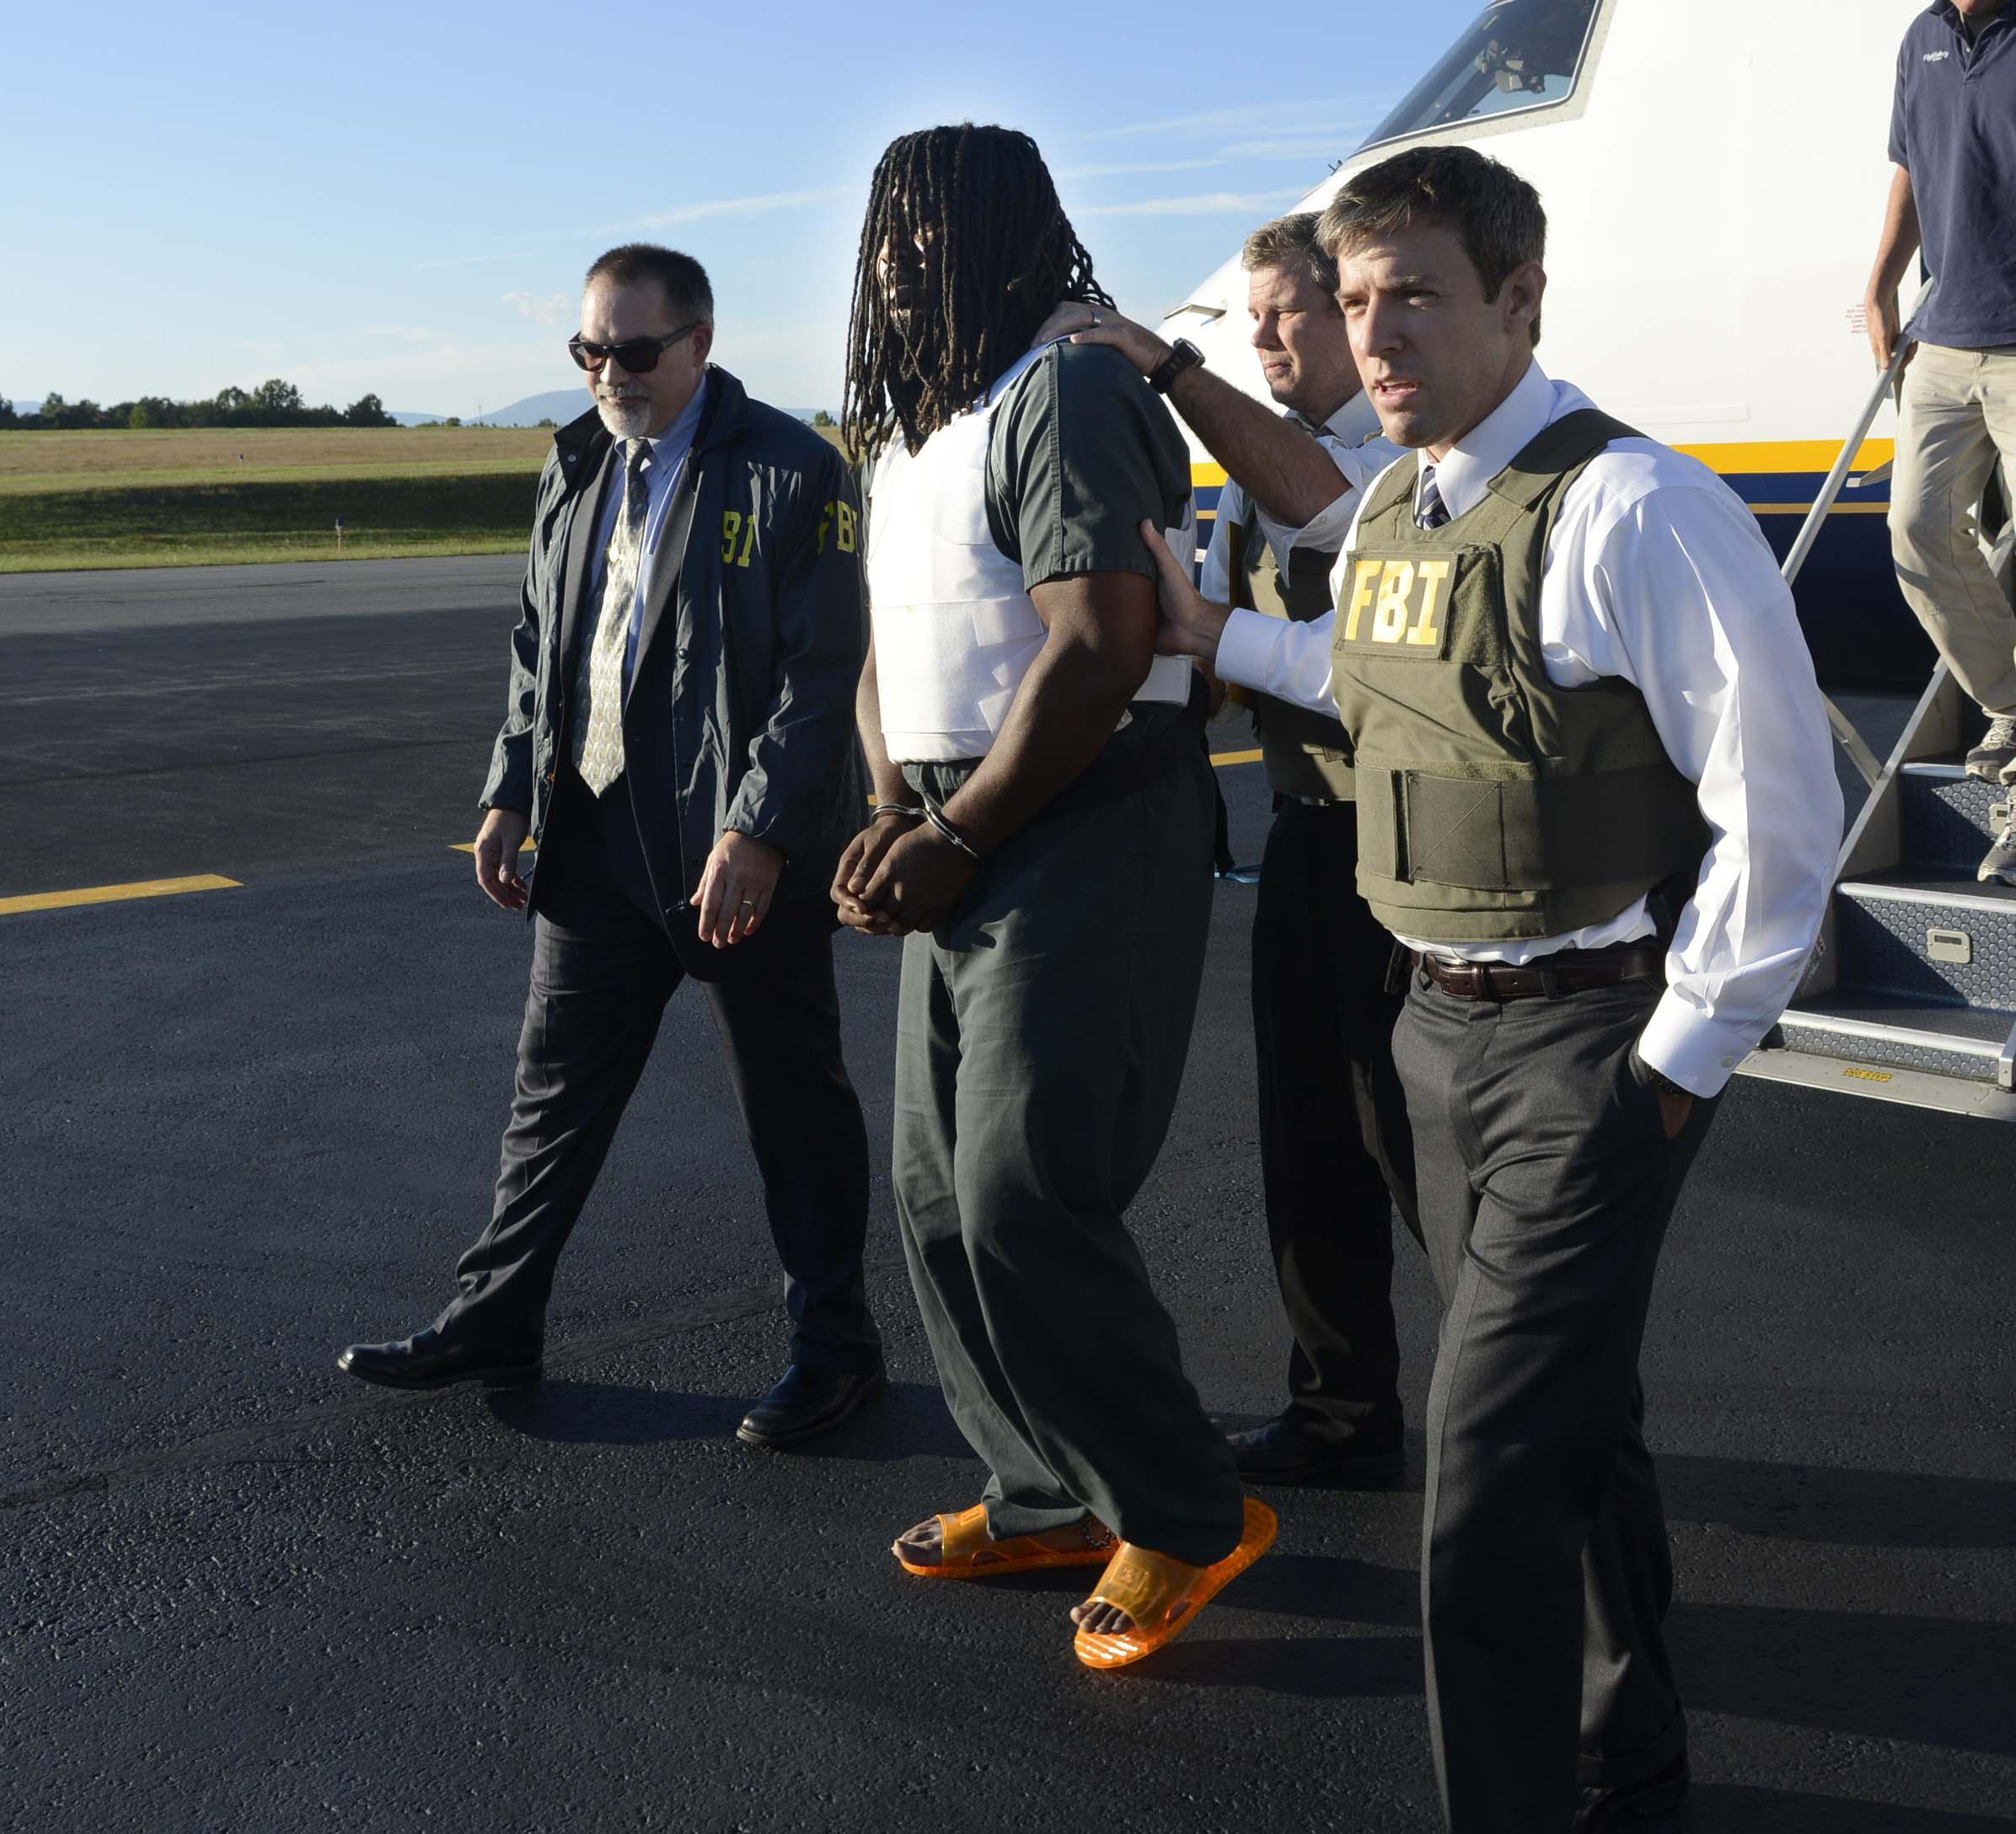 From left: FBI agents escort Jesse Matthew into the custody of the Charlottesville Police Department September 26, 2014 in Charlottesville, Virginia.